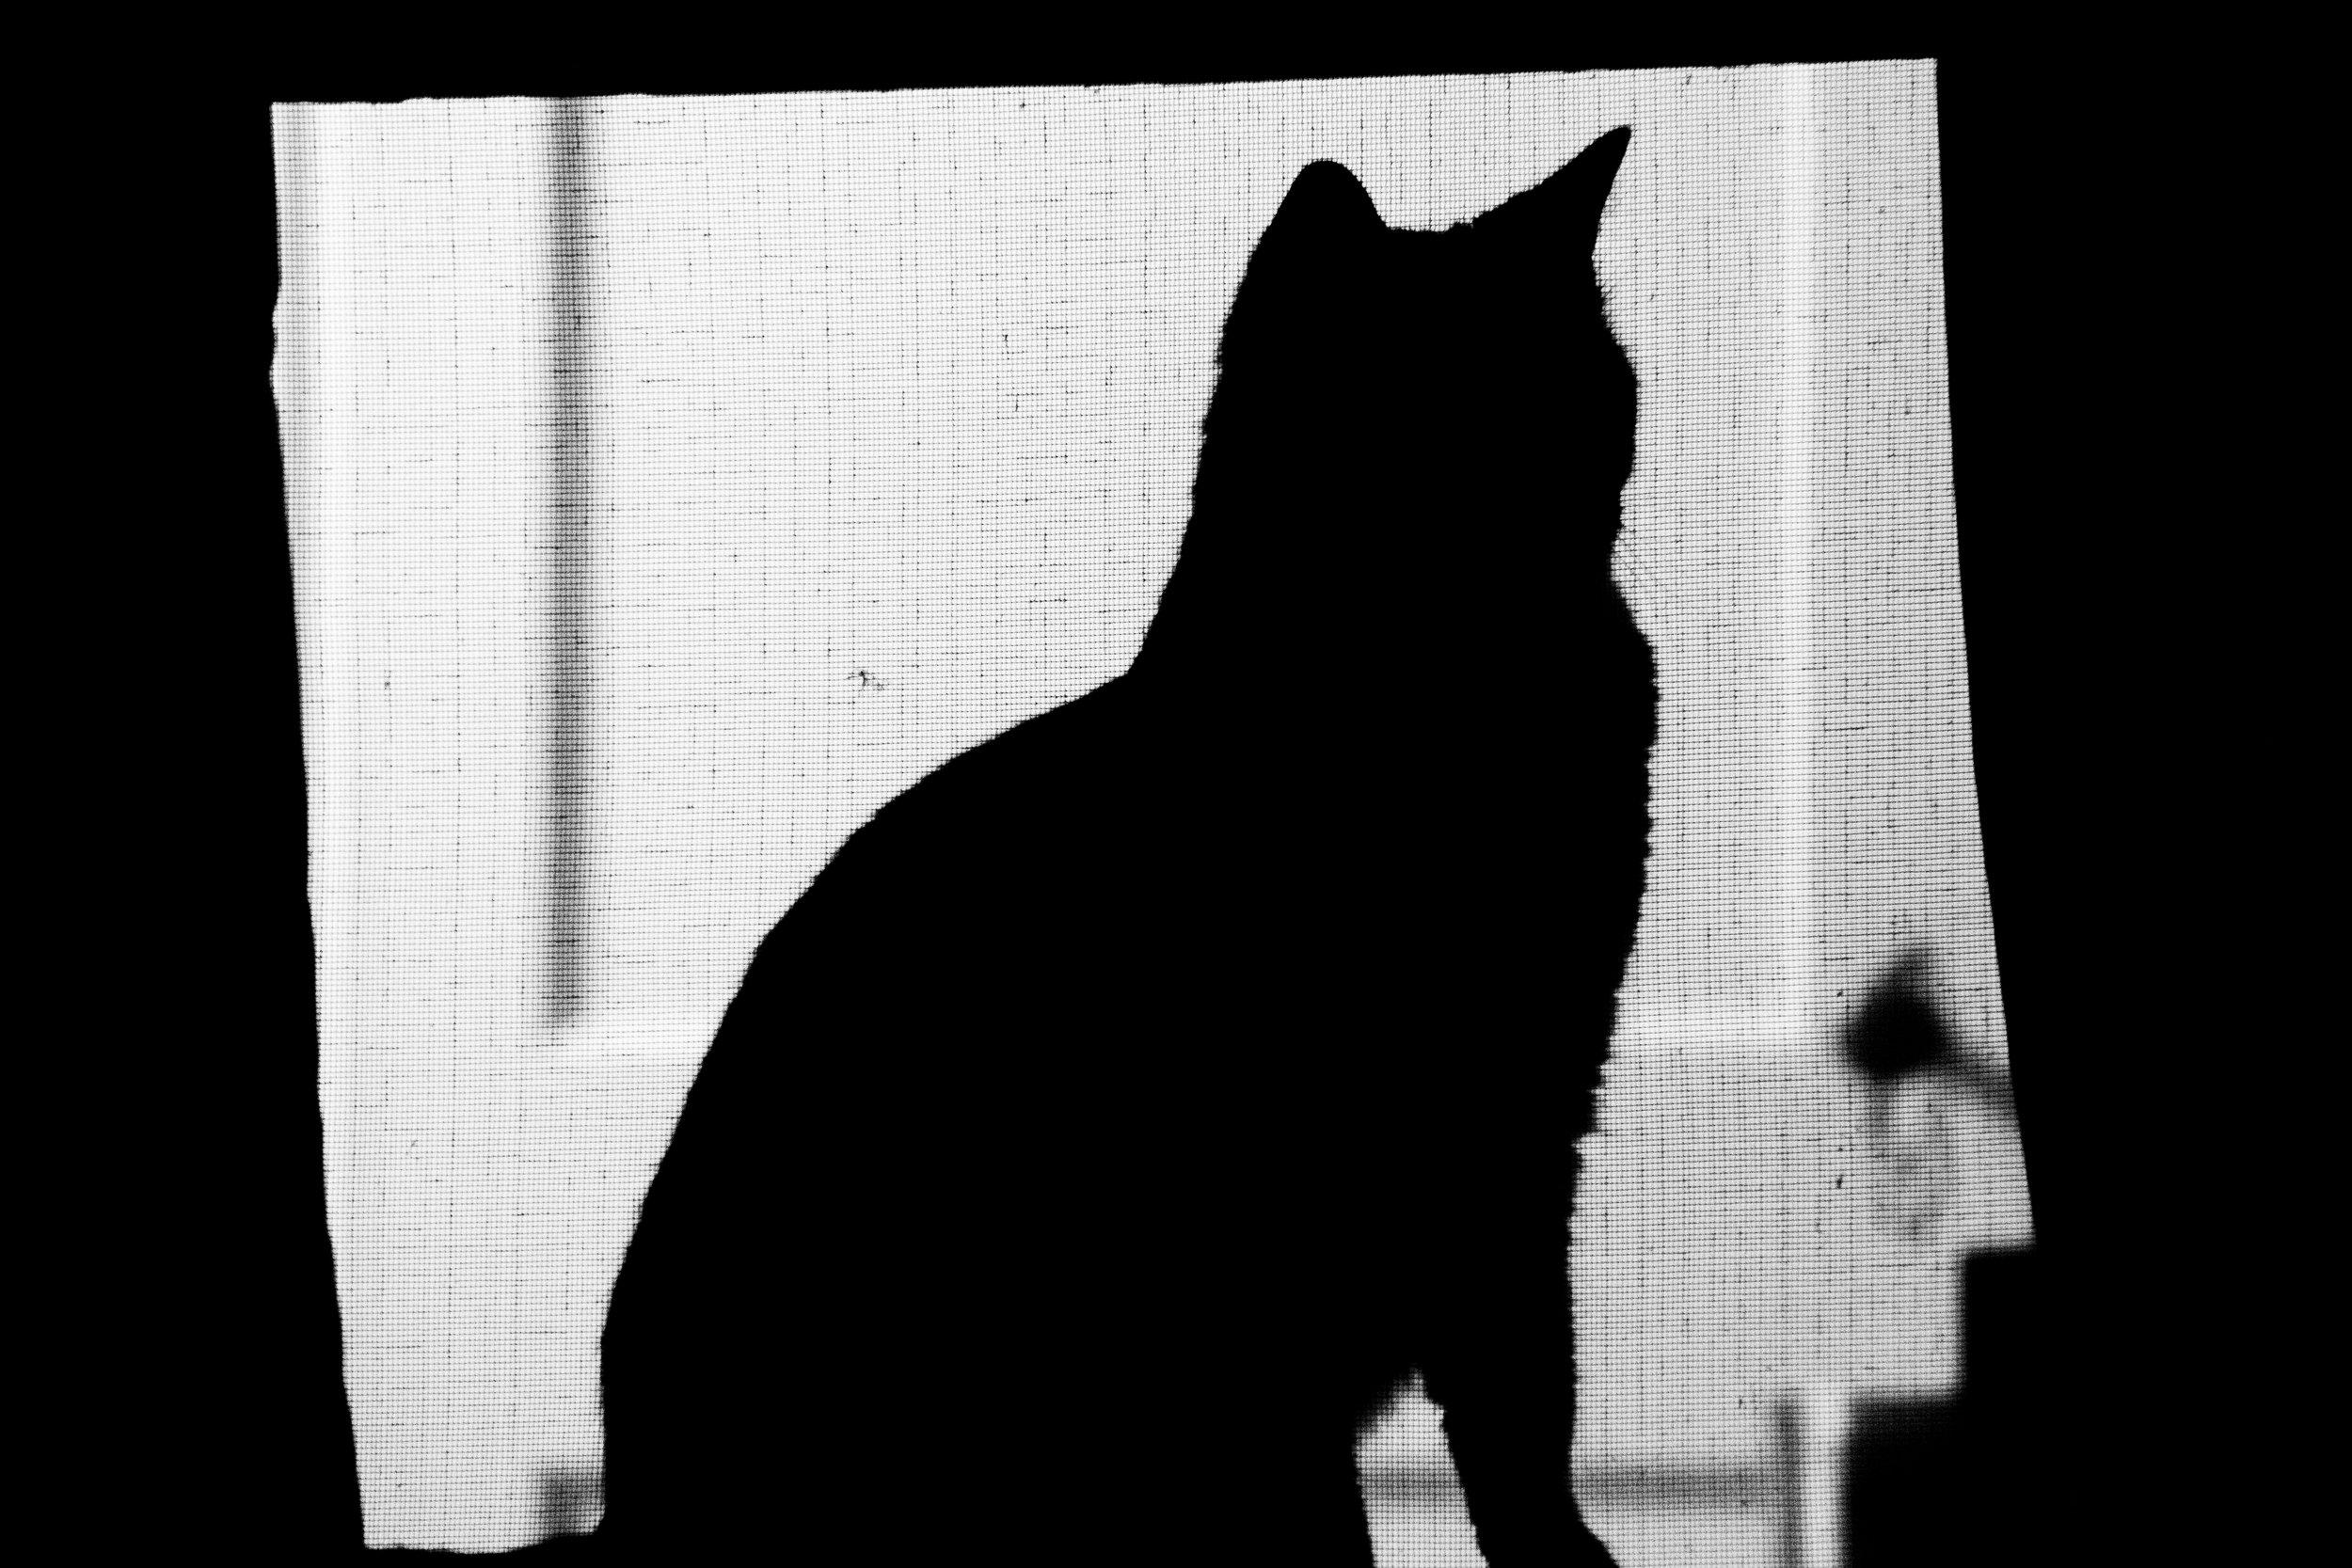 Pablito Silhouette-3.jpg